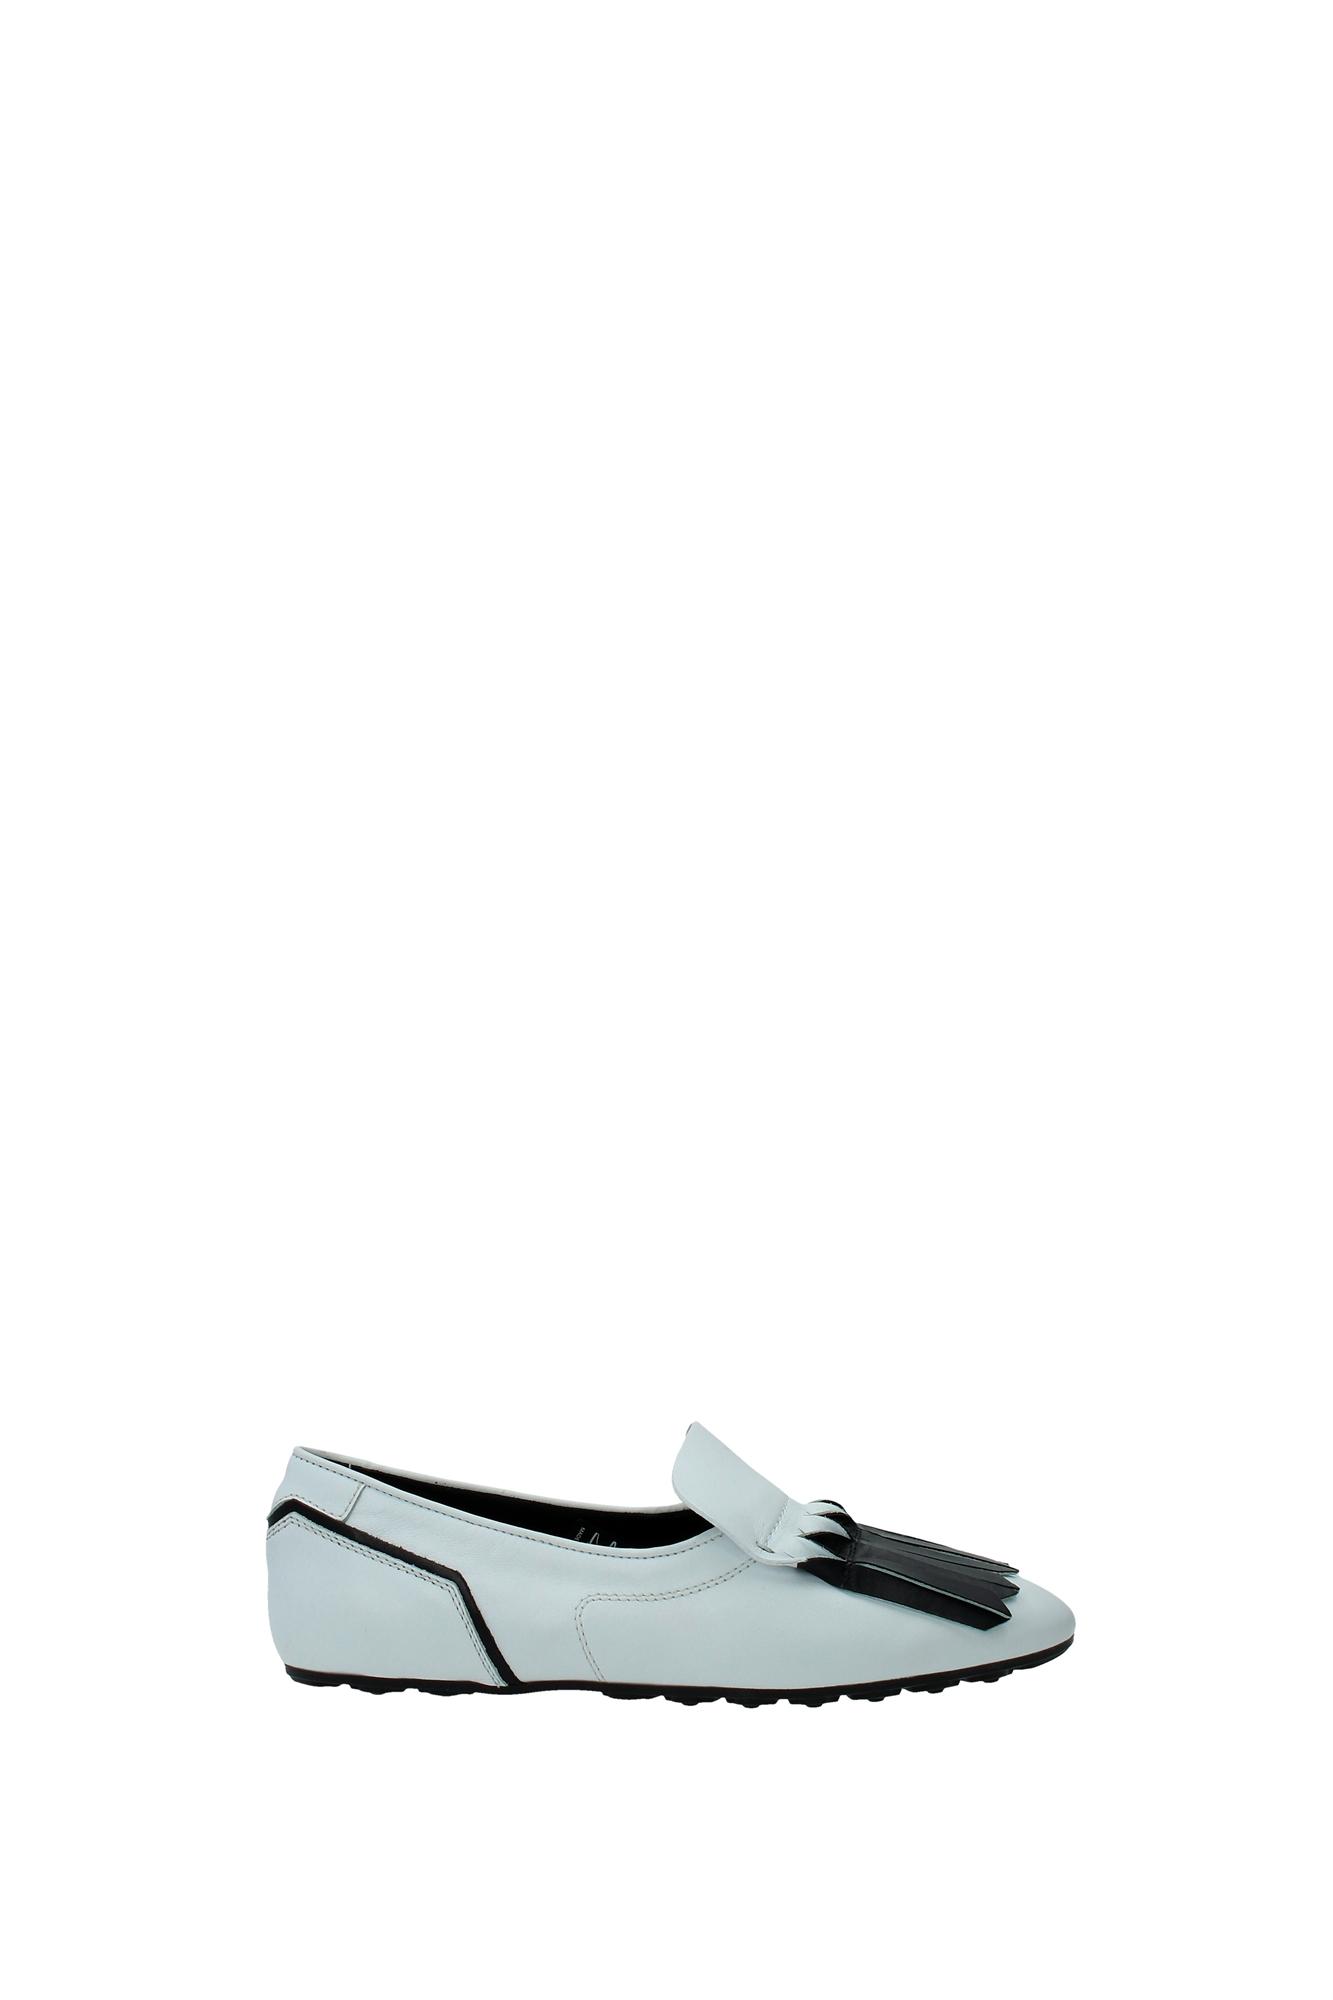 Sneakers (XXW0YY0Q290XTC0001) Tod's Women -  (XXW0YY0Q290XTC0001) Sneakers 12e5e3